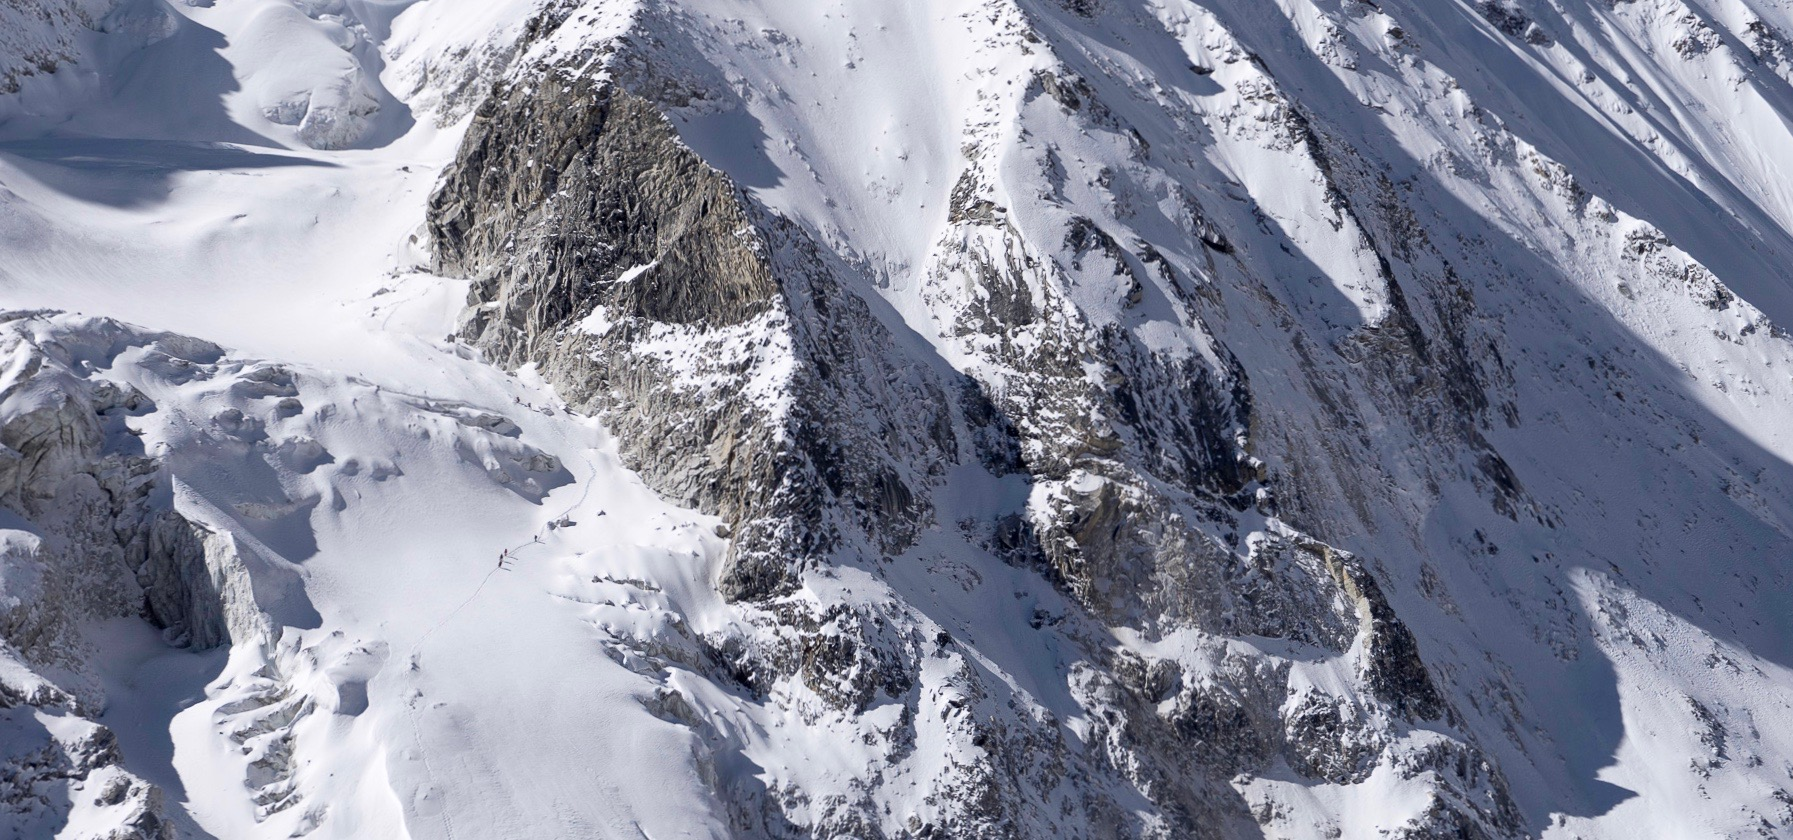 Descending Larkey Peak